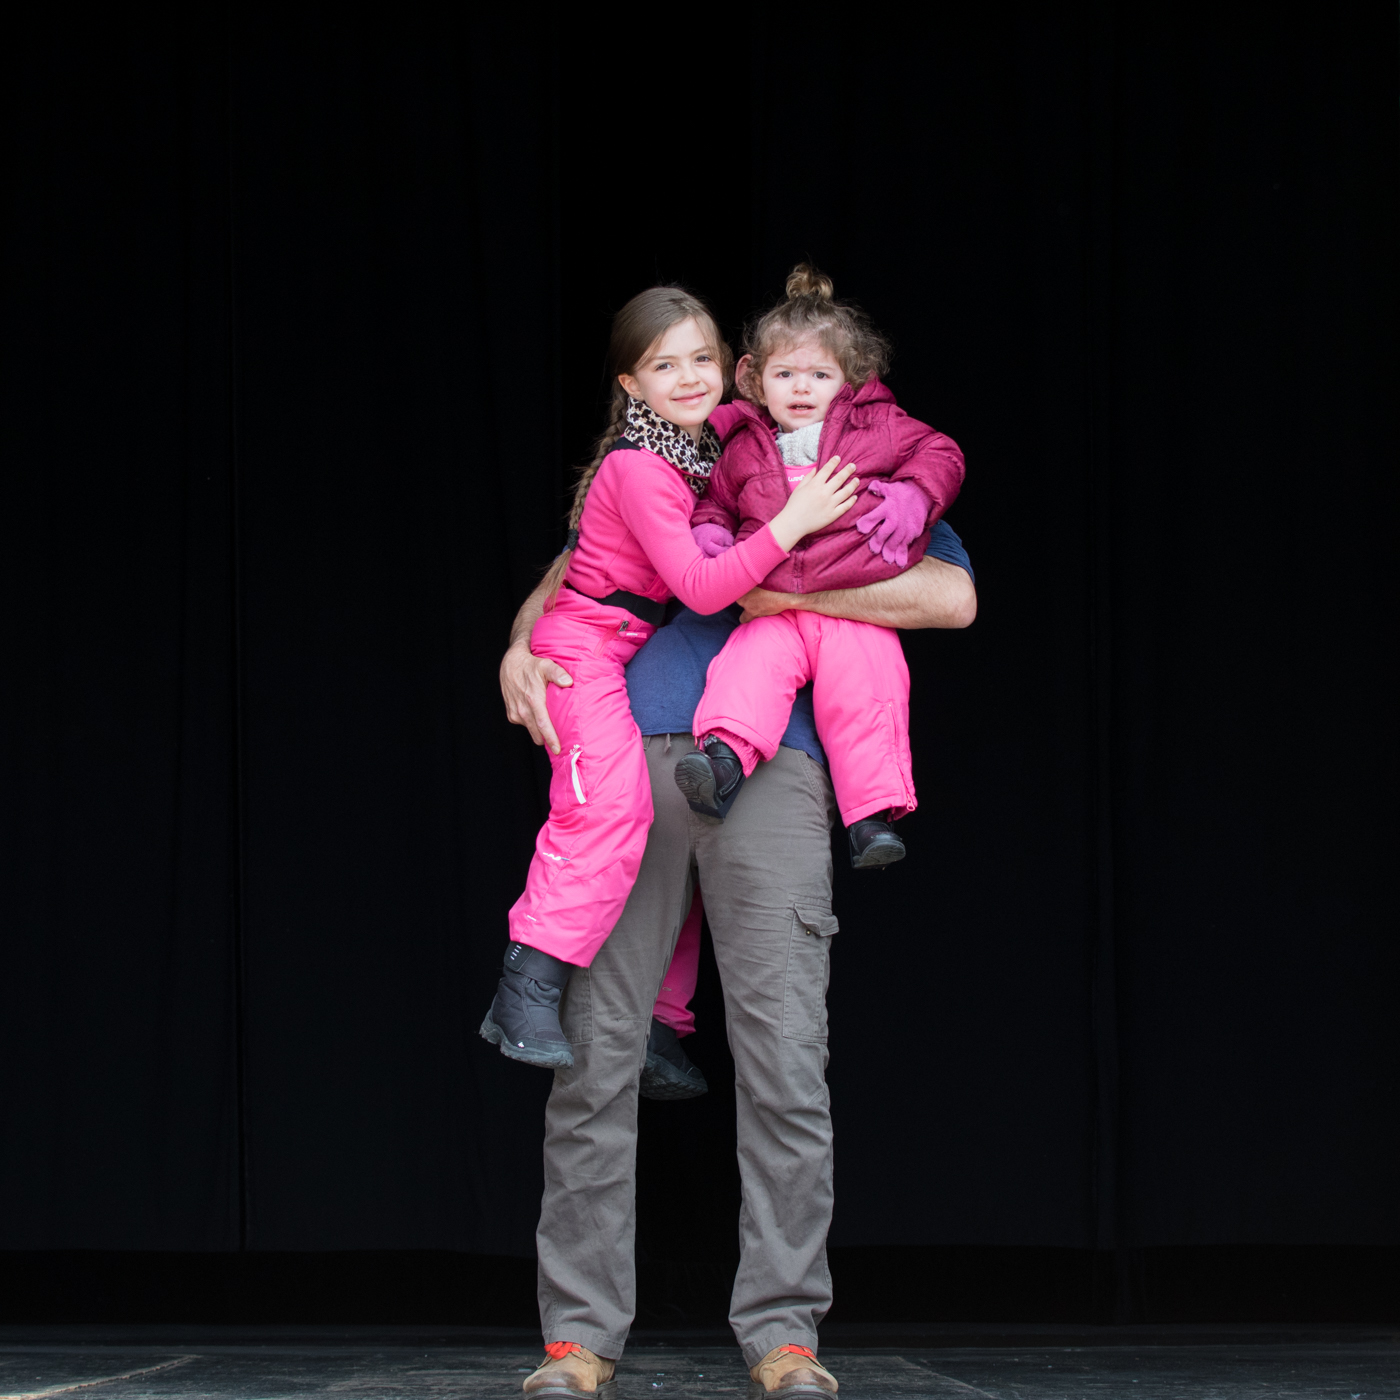 Backstage 2016 - La vie en rose